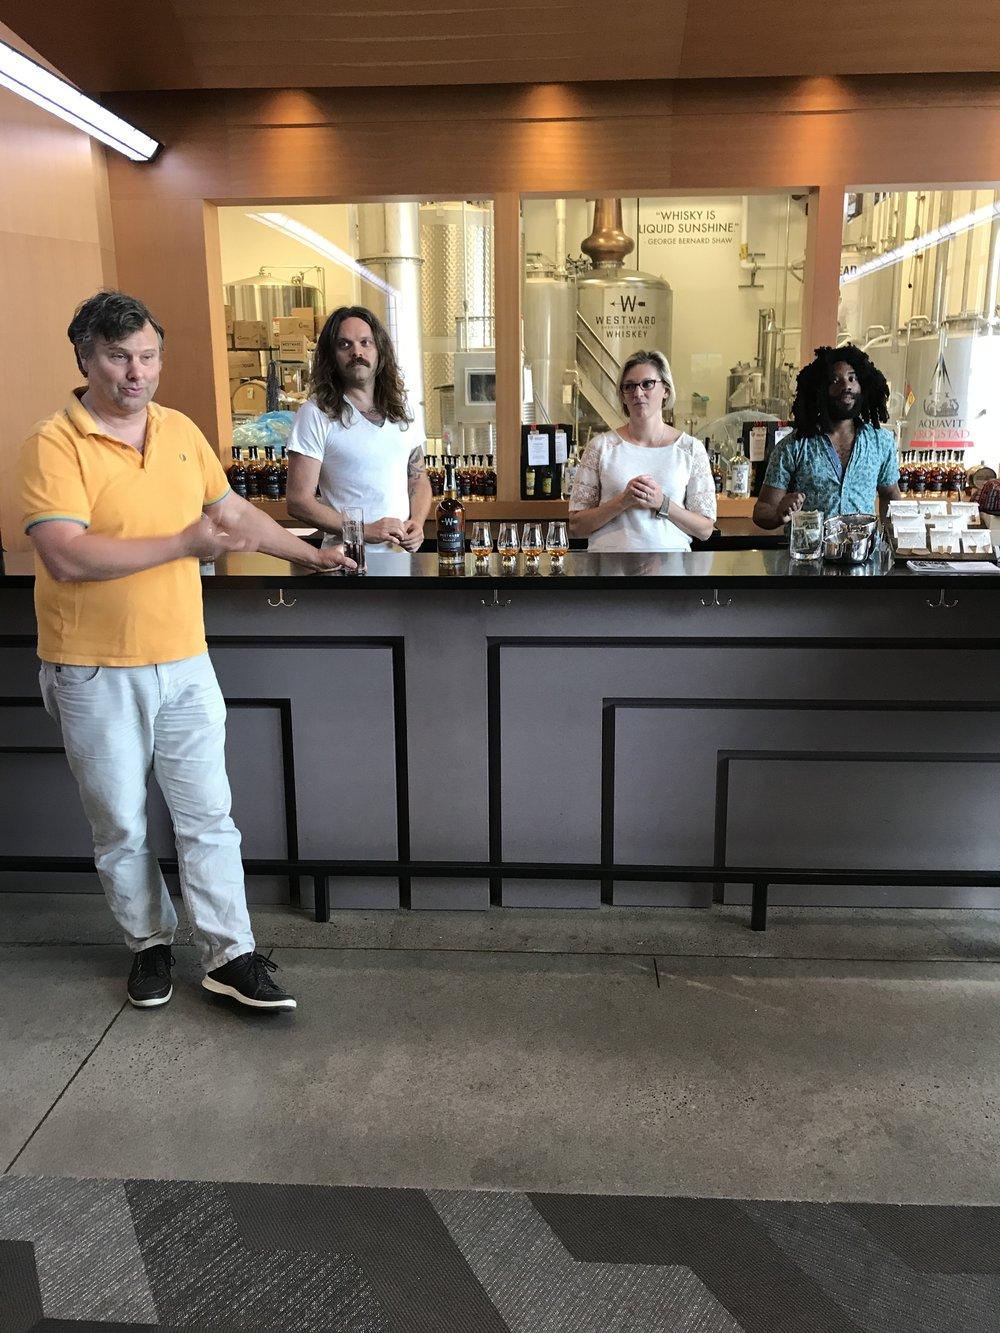 Christian Krogstad, Miles Monroe, and House Spirits staff.